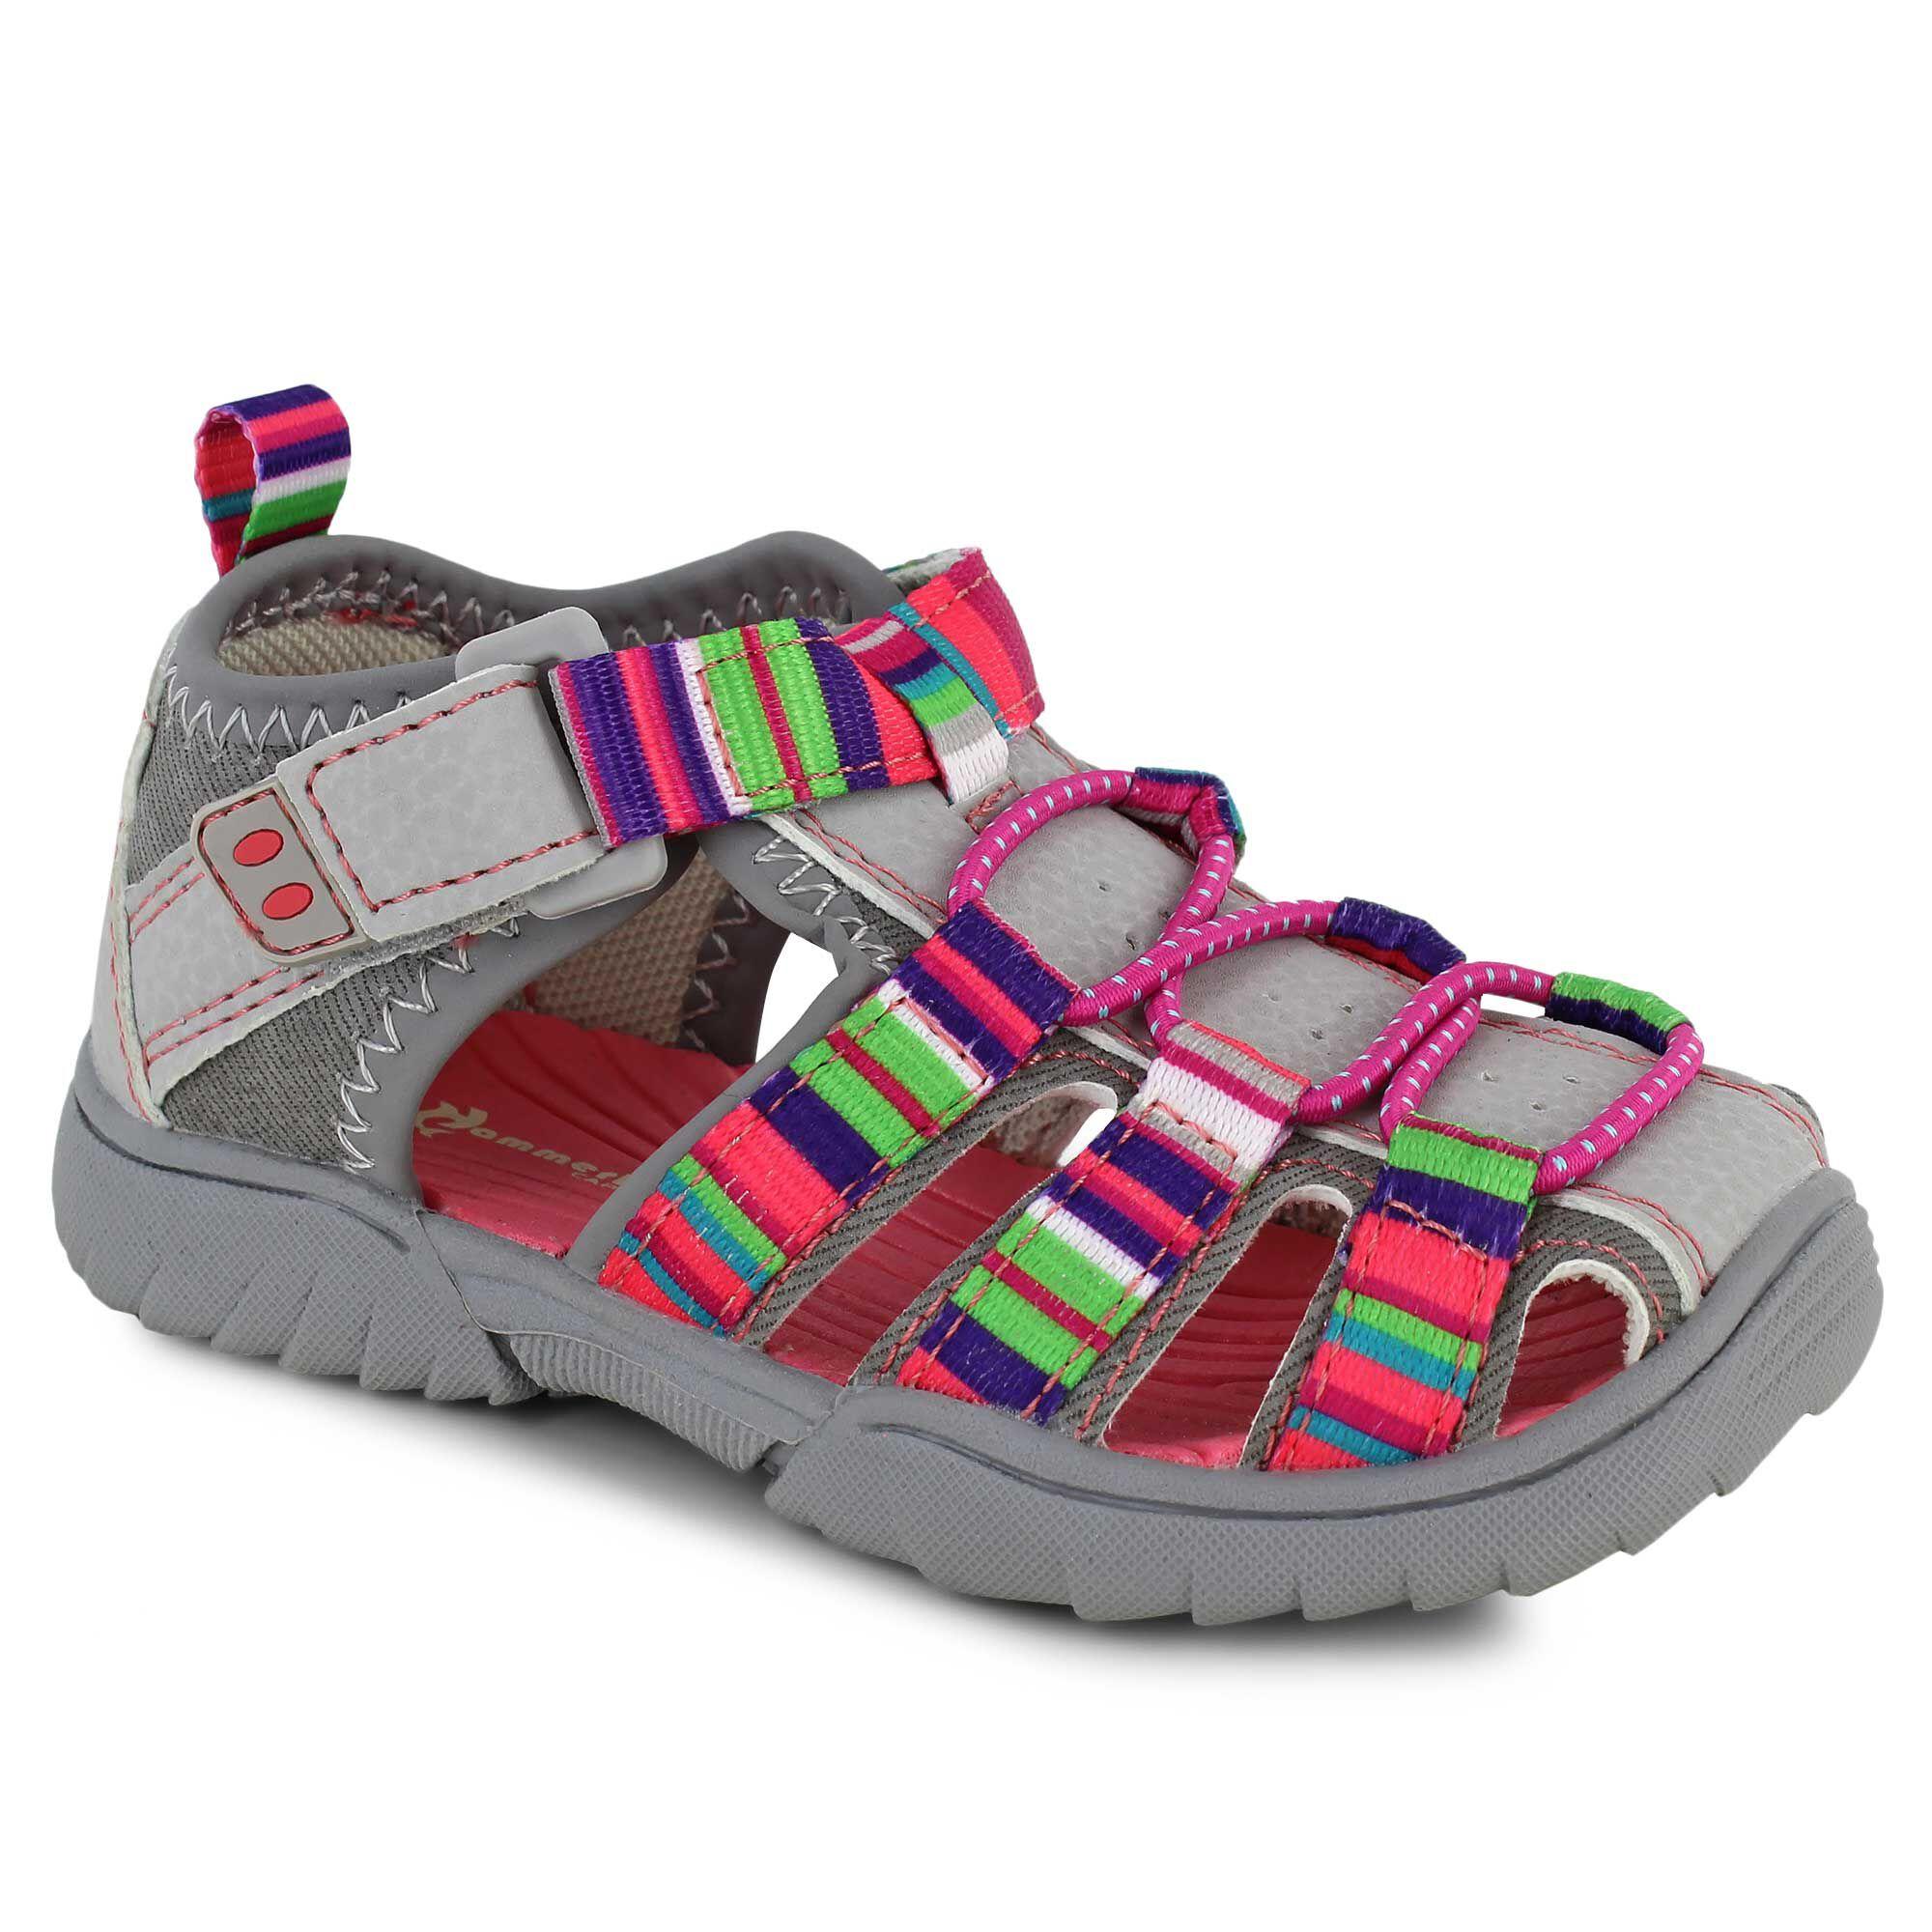 Nike Infant Shoes Shop Now at SHOE SHOW